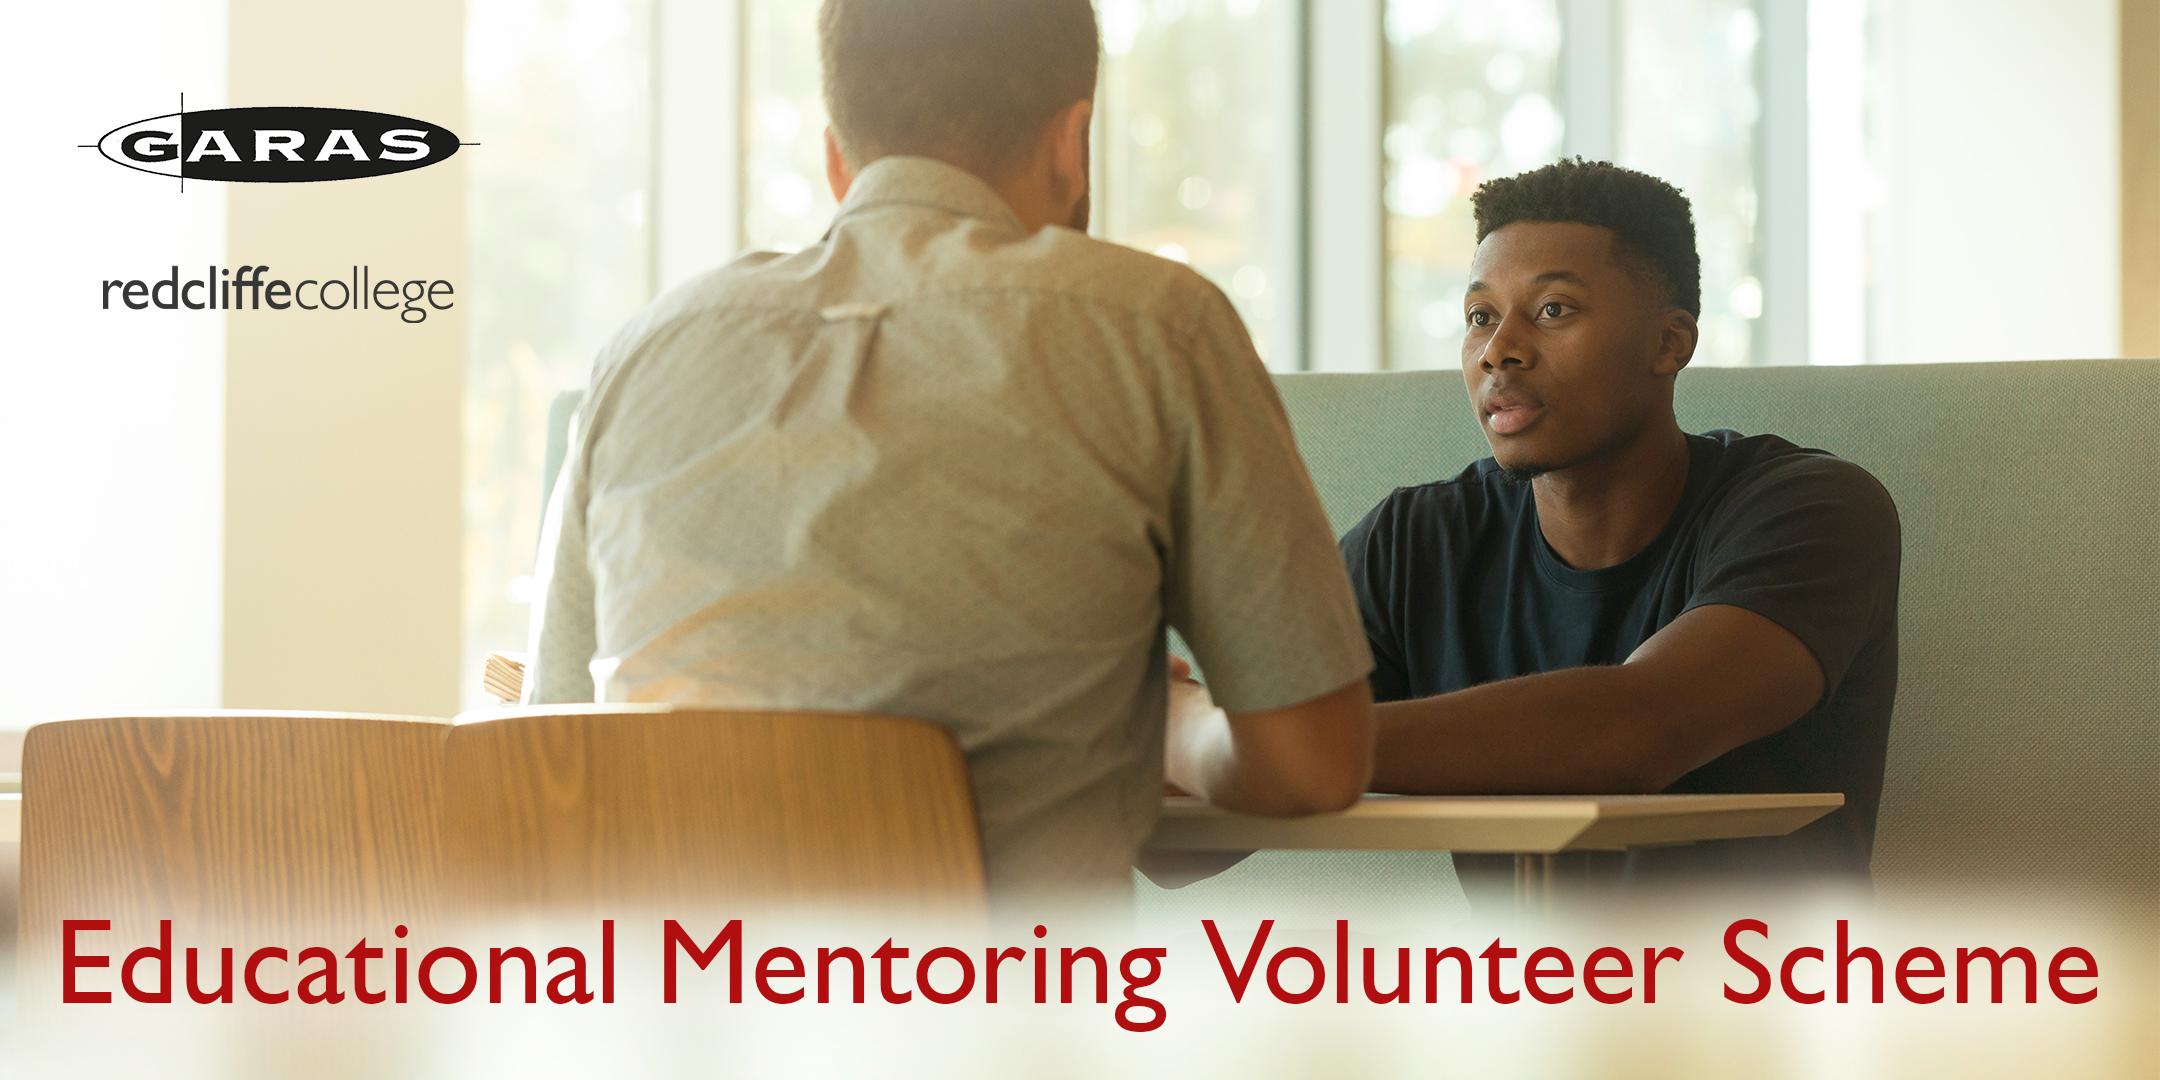 Educational Mentoring Volunteer Scheme